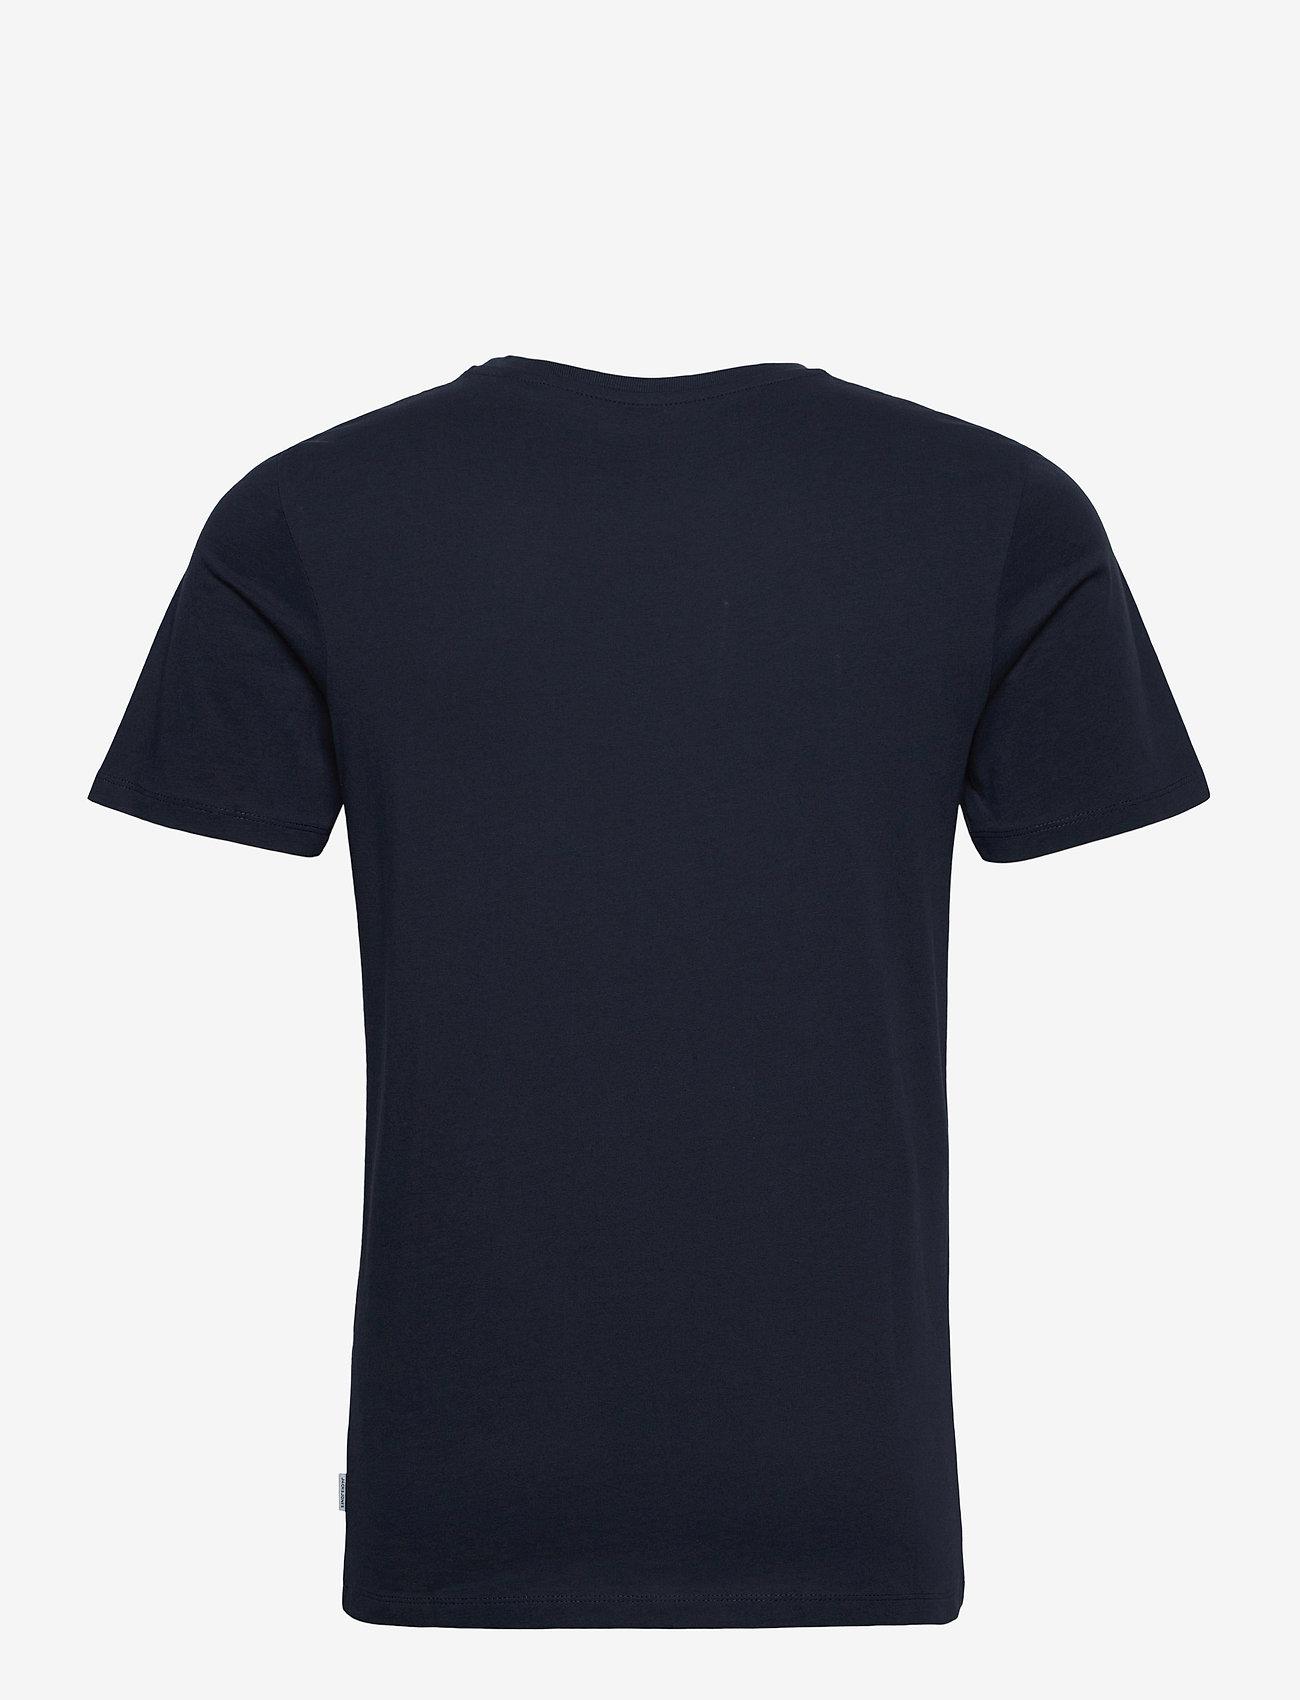 Jack & Jones - JJEORGANIC BASIC TEE SS O-NECK - basic t-shirts - navy blazer - 1